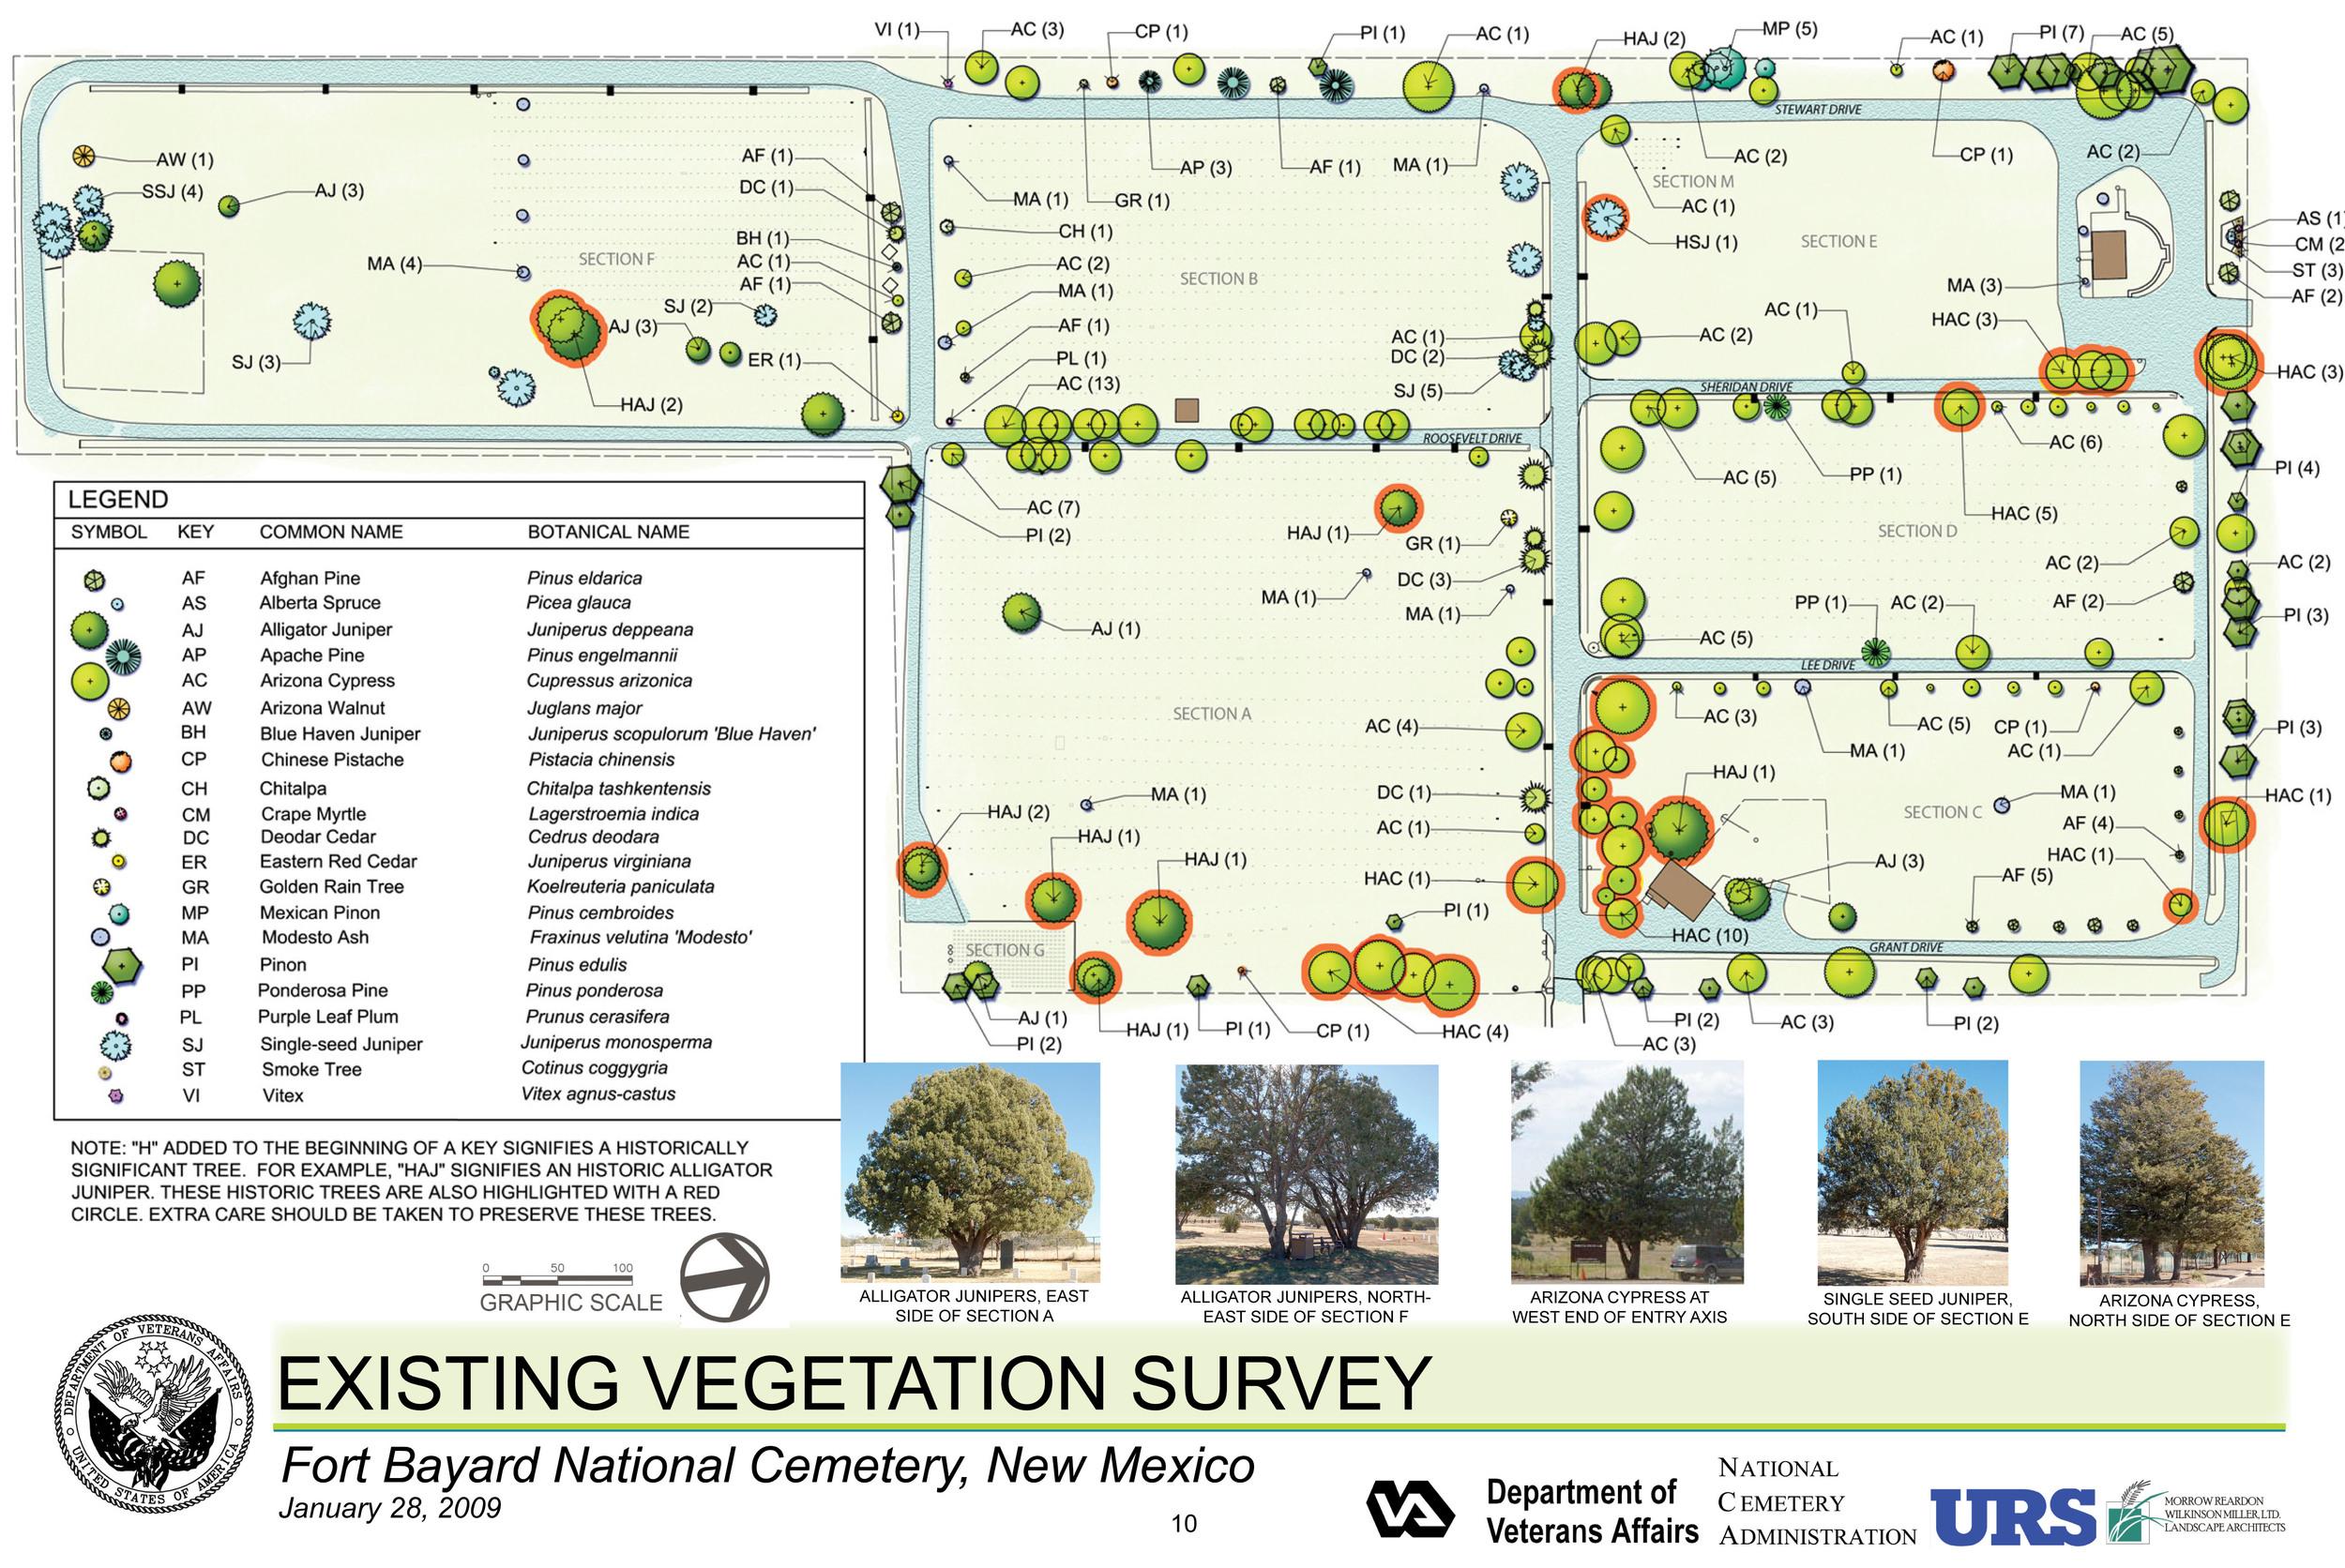 Fort Bayard National Cemetery Existing Vegetation Survey